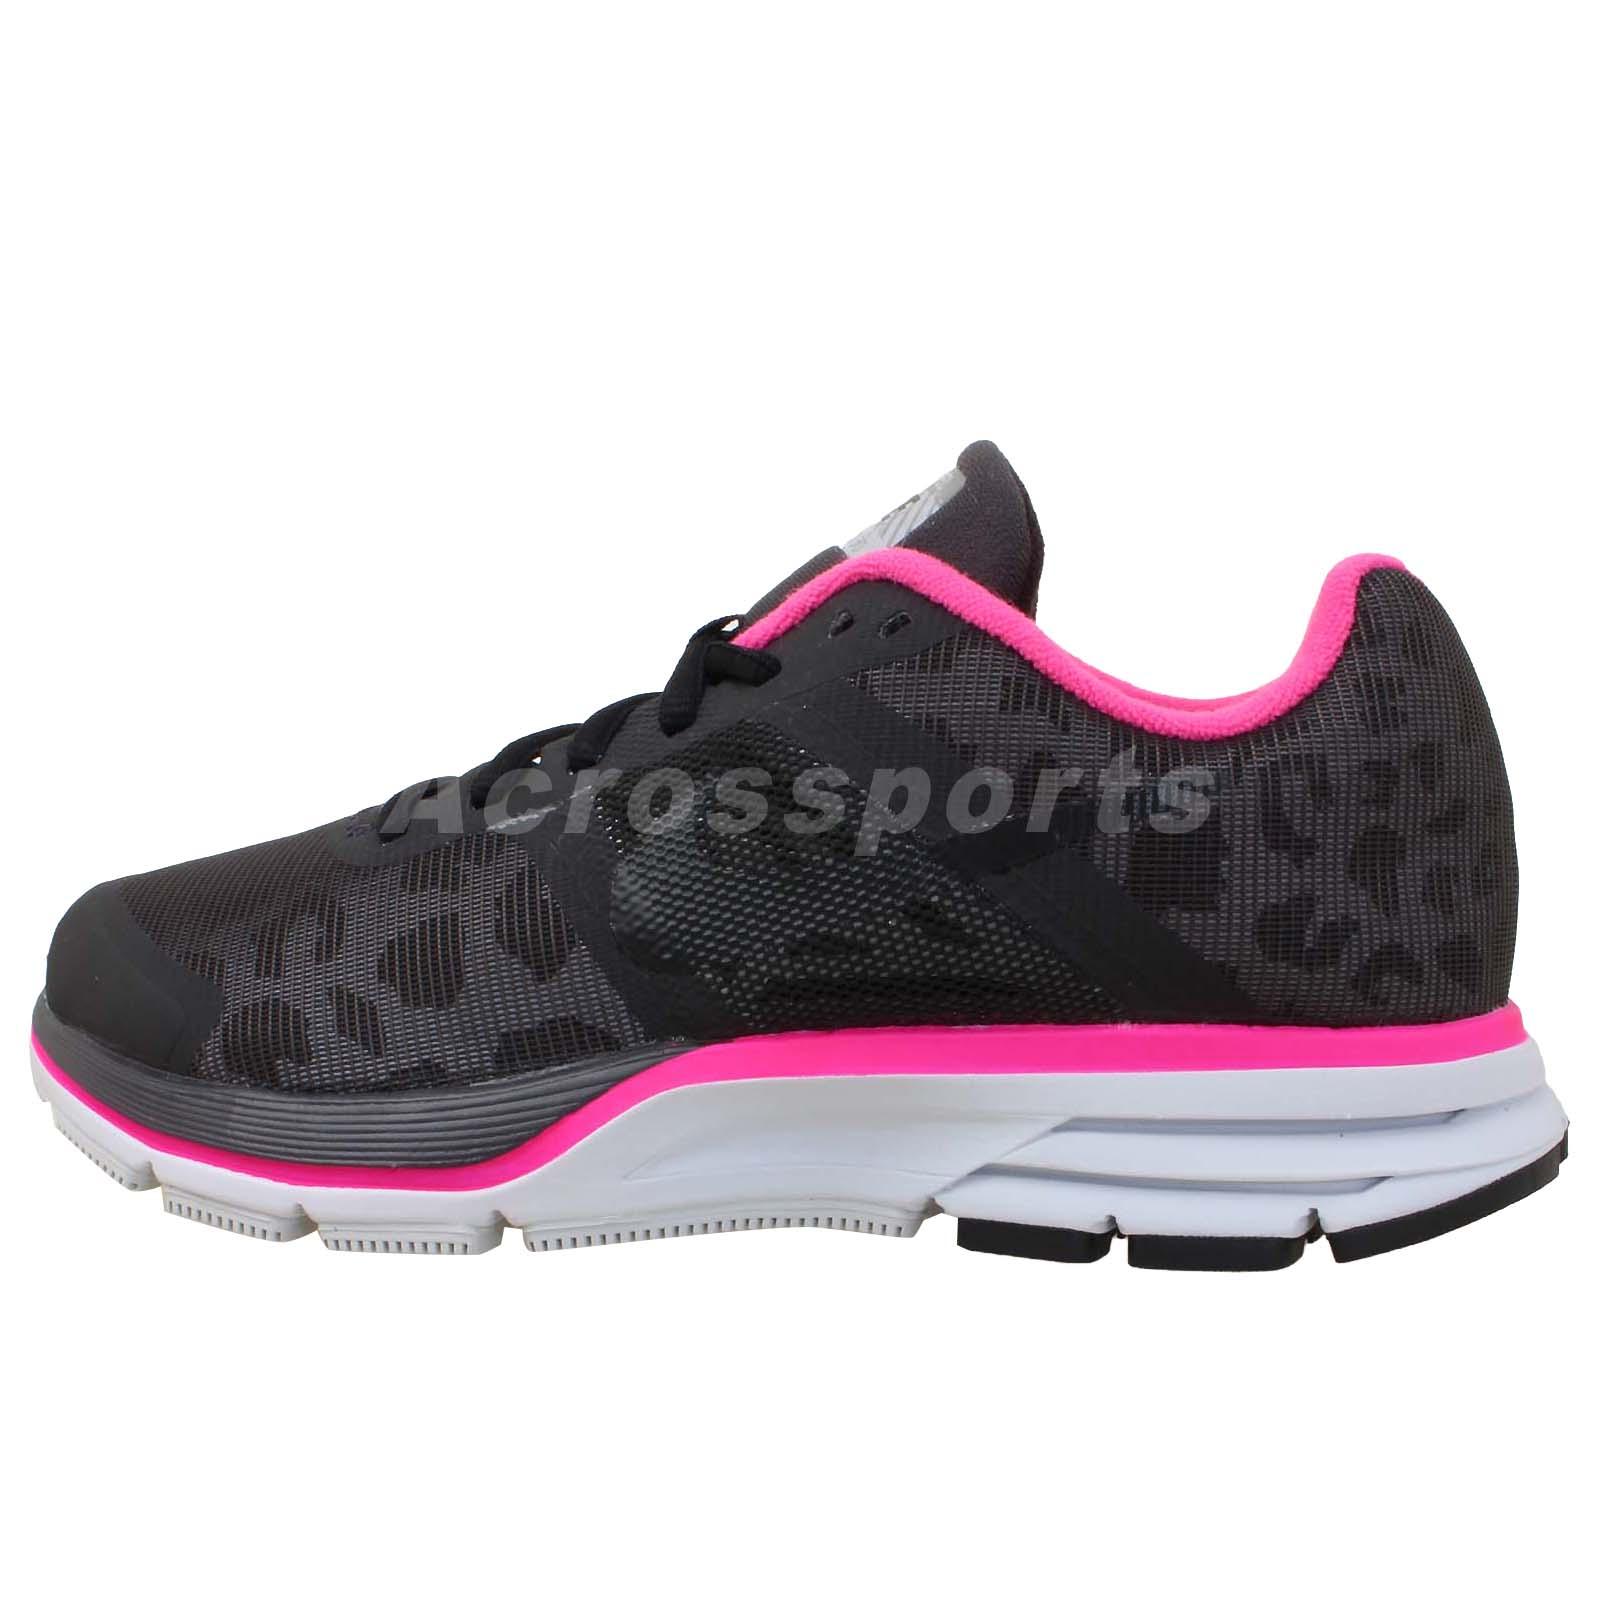 nike wmns air pegasus 30 shield flash pack leopard 2013 womens running shoes ebay